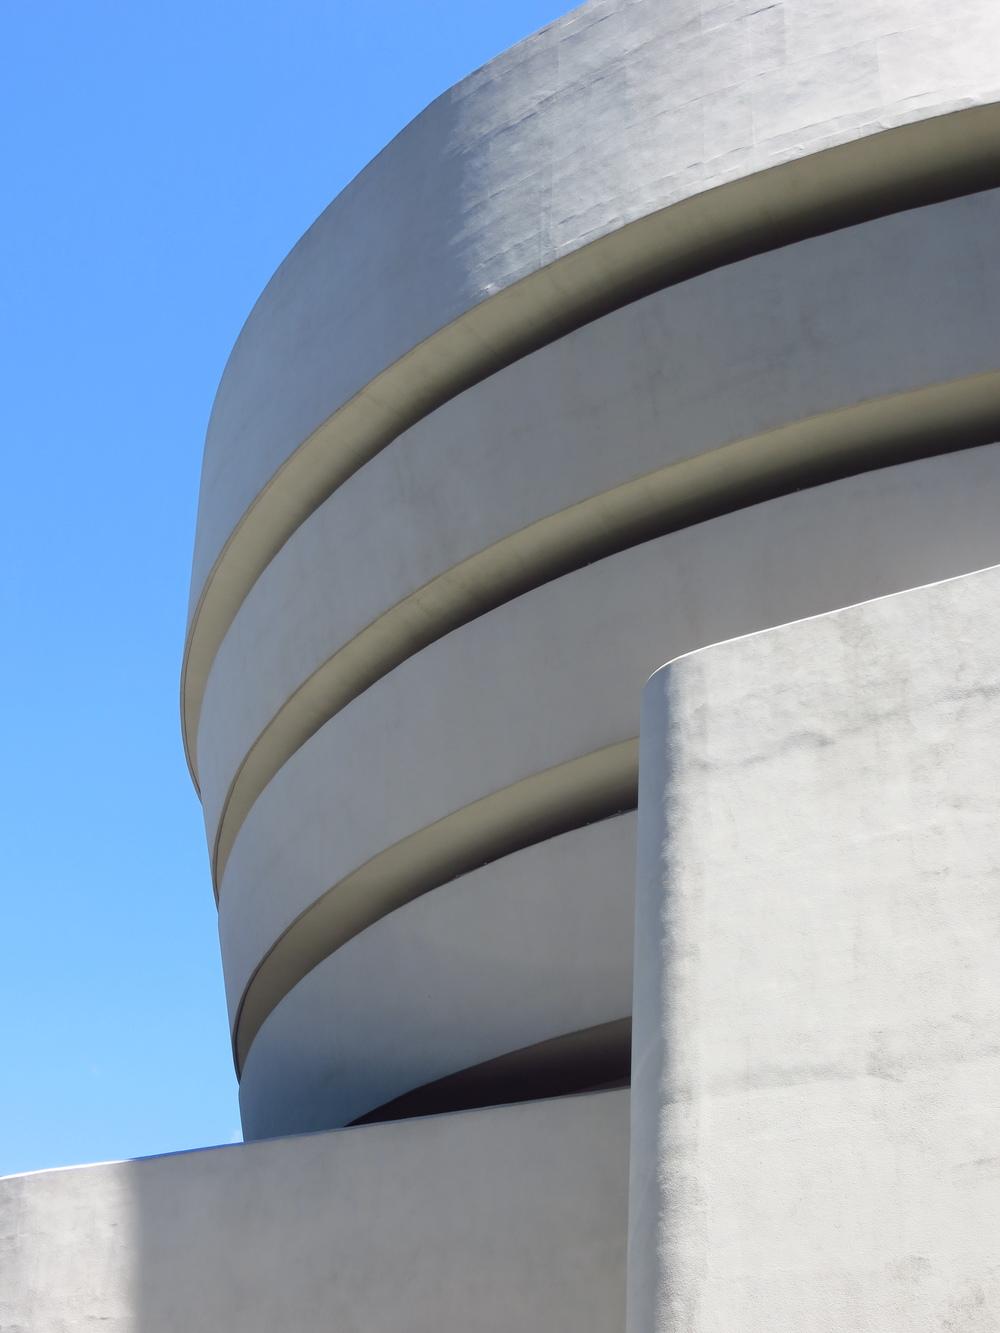 Guggenheim Museum - side